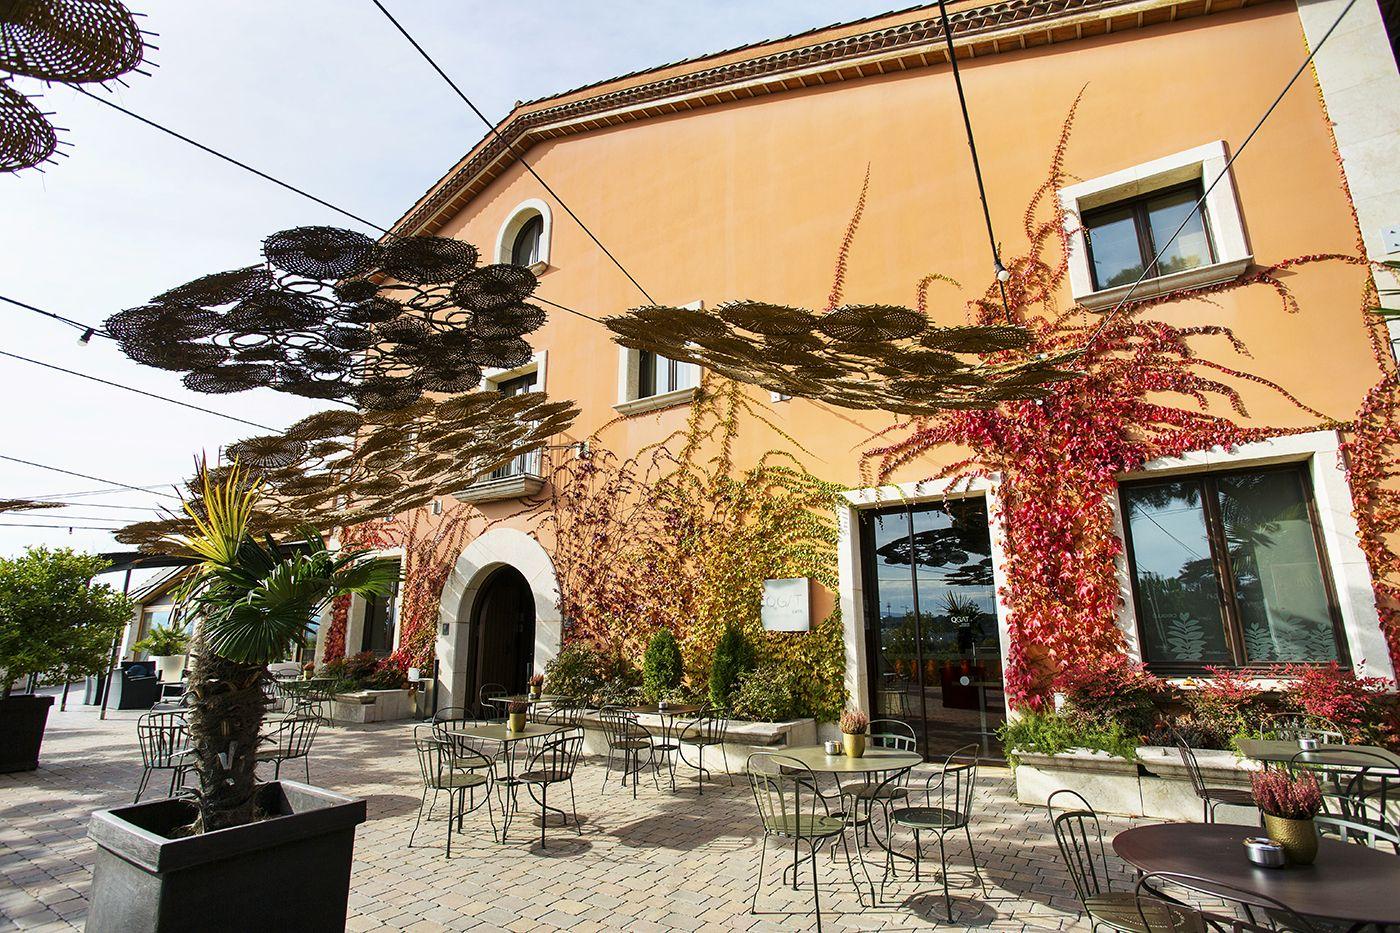 Una terrassa perfecta per prendre una copa FOTO: Cedida